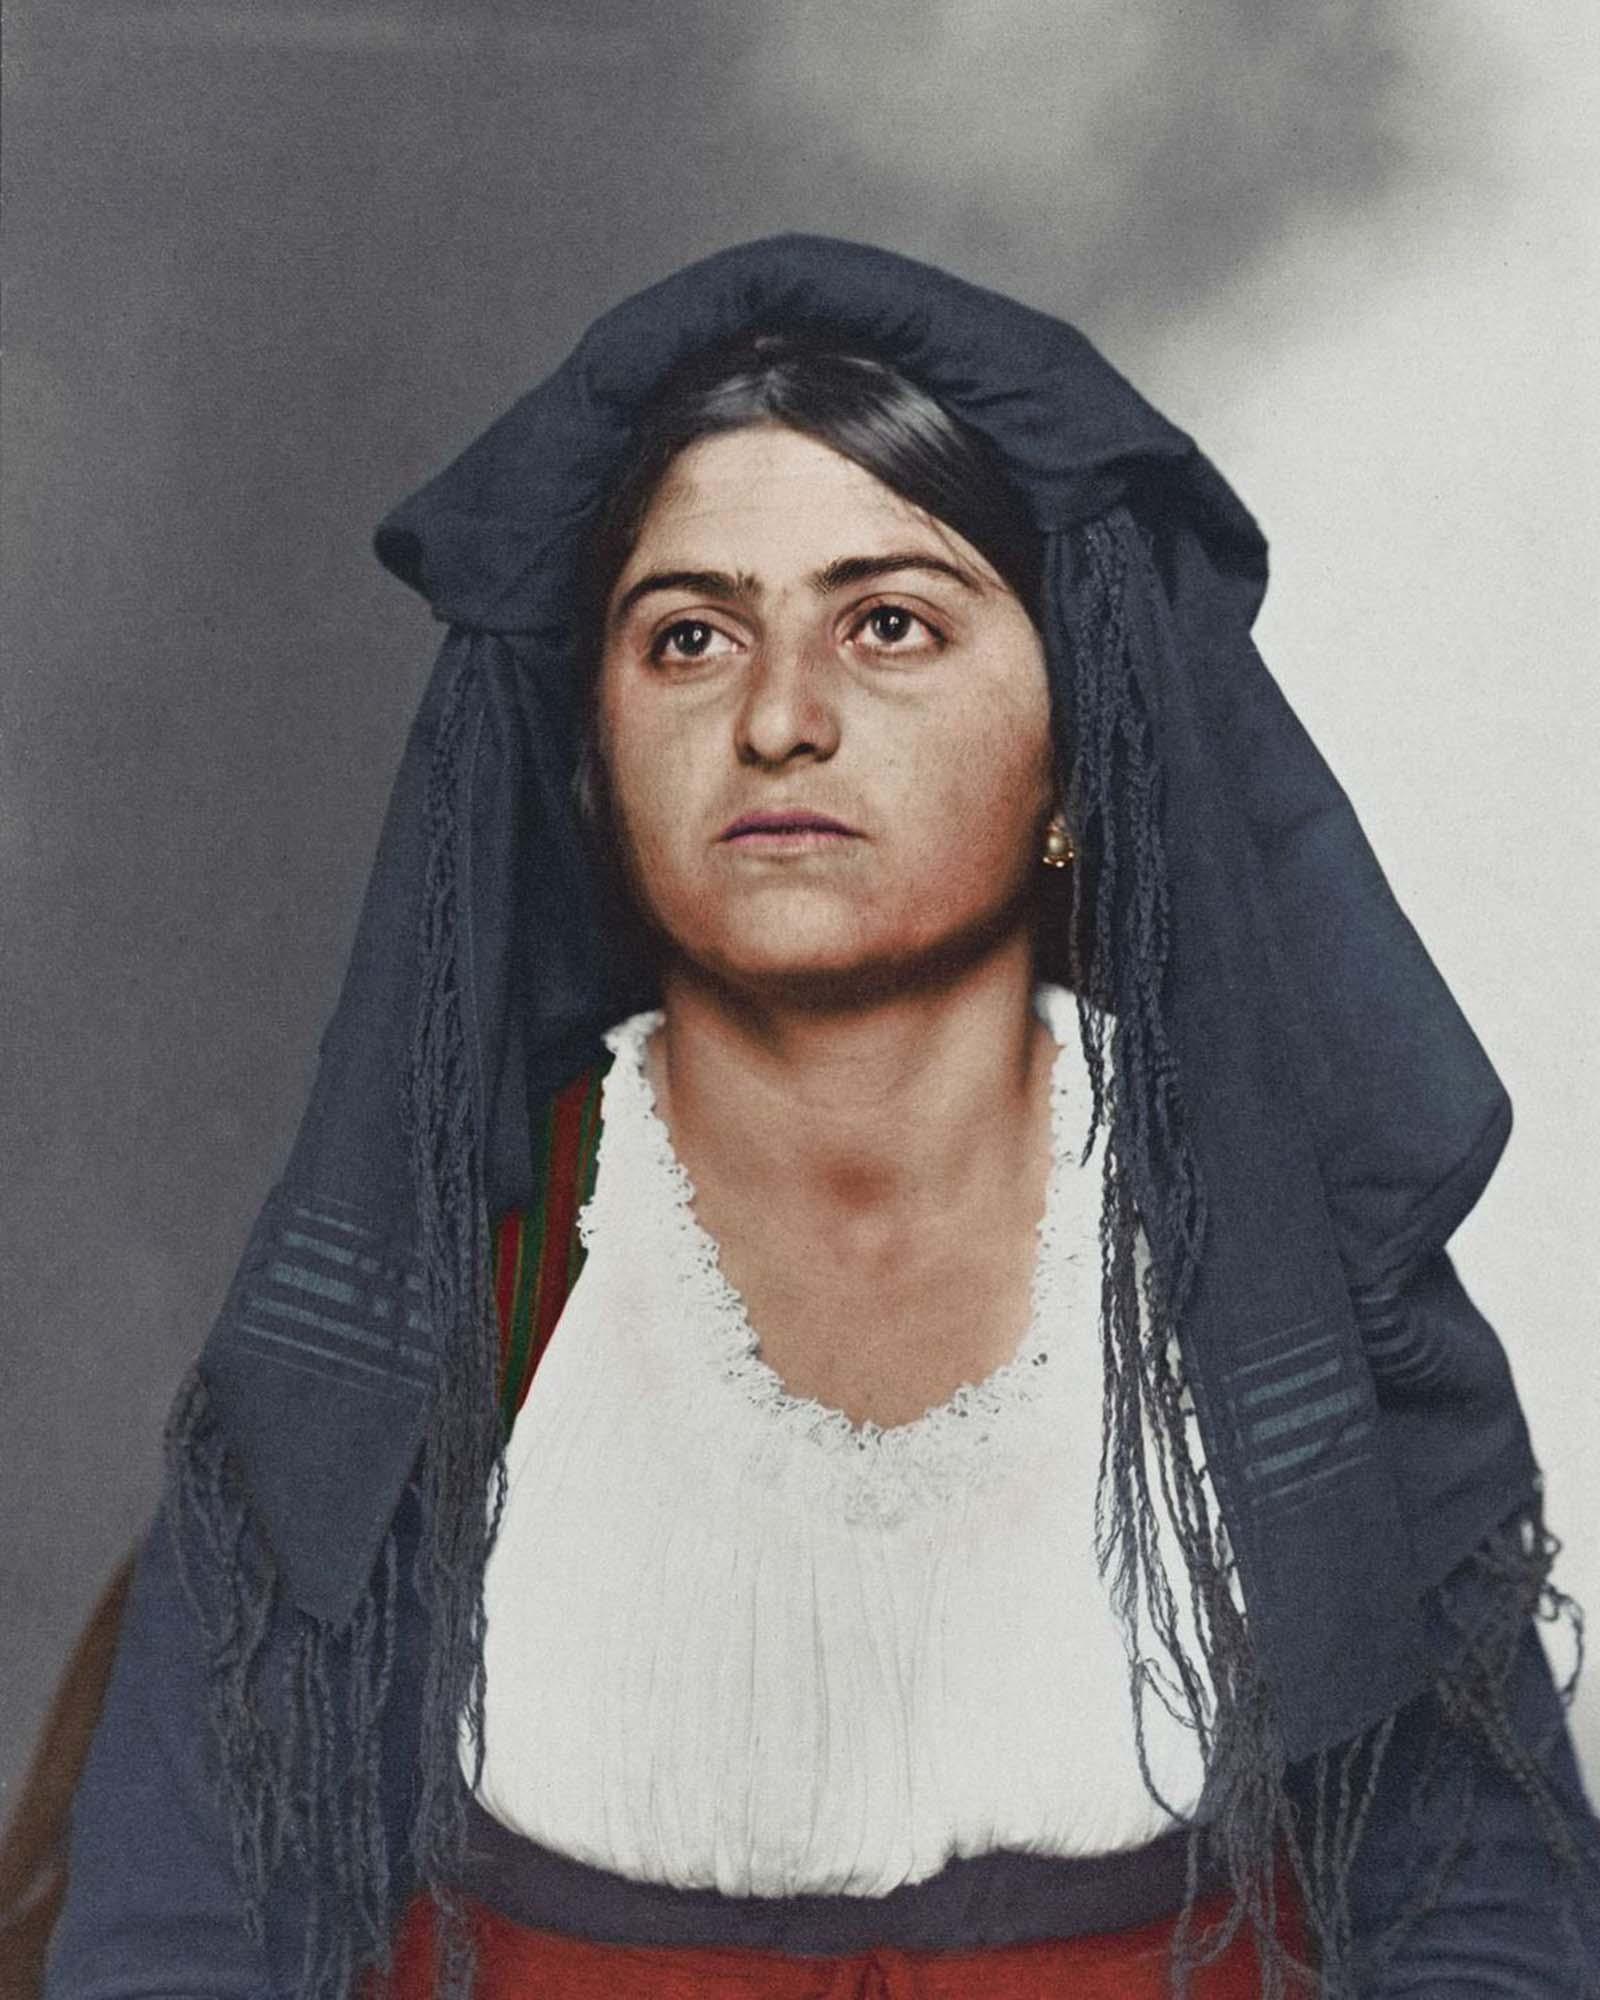 ellis islandi immigrants colorized